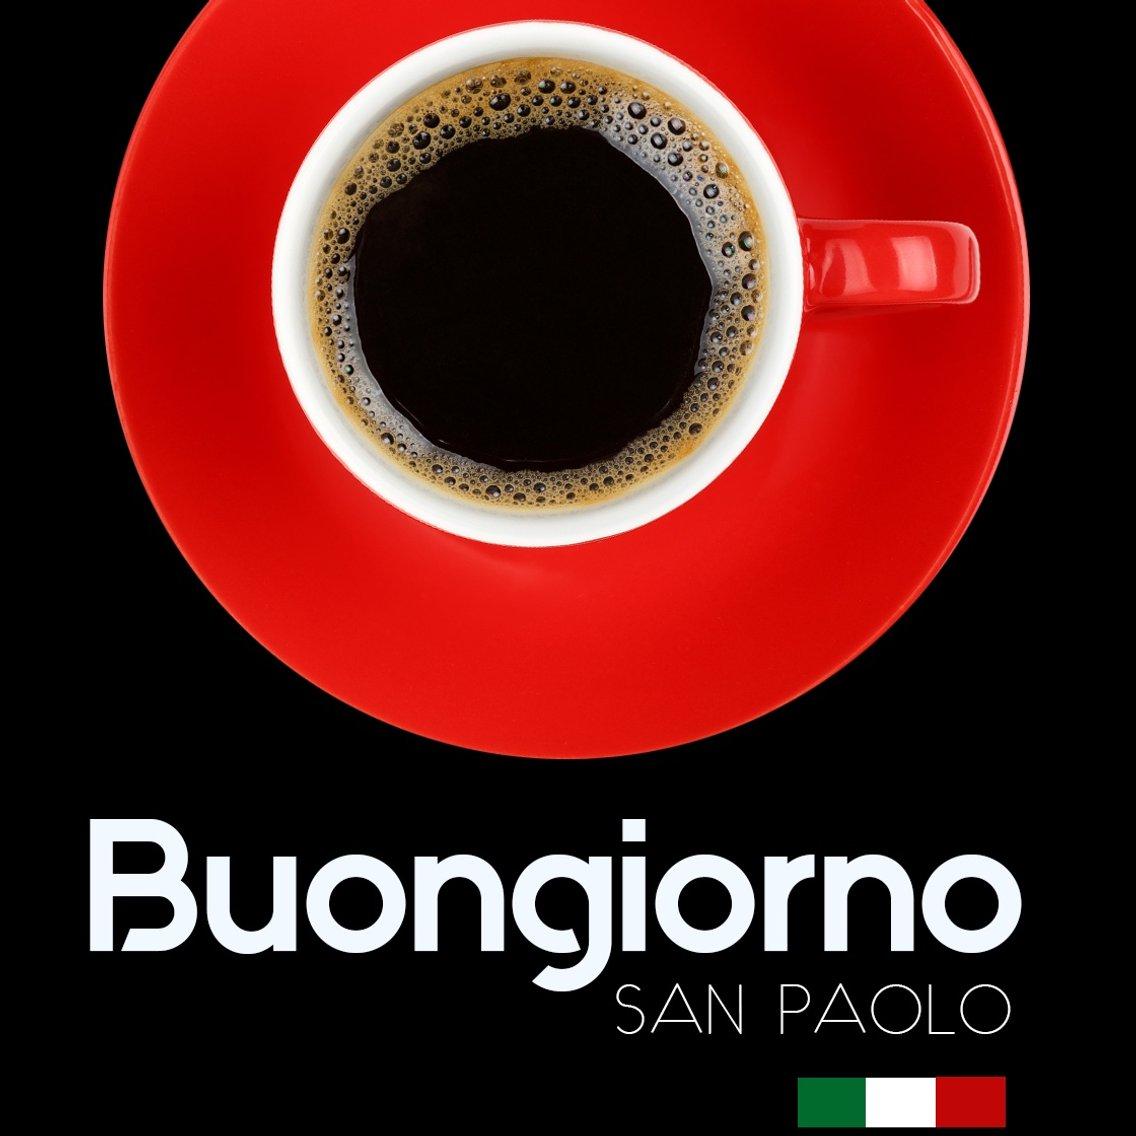 Buongiorno San Paolo - imagen de portada